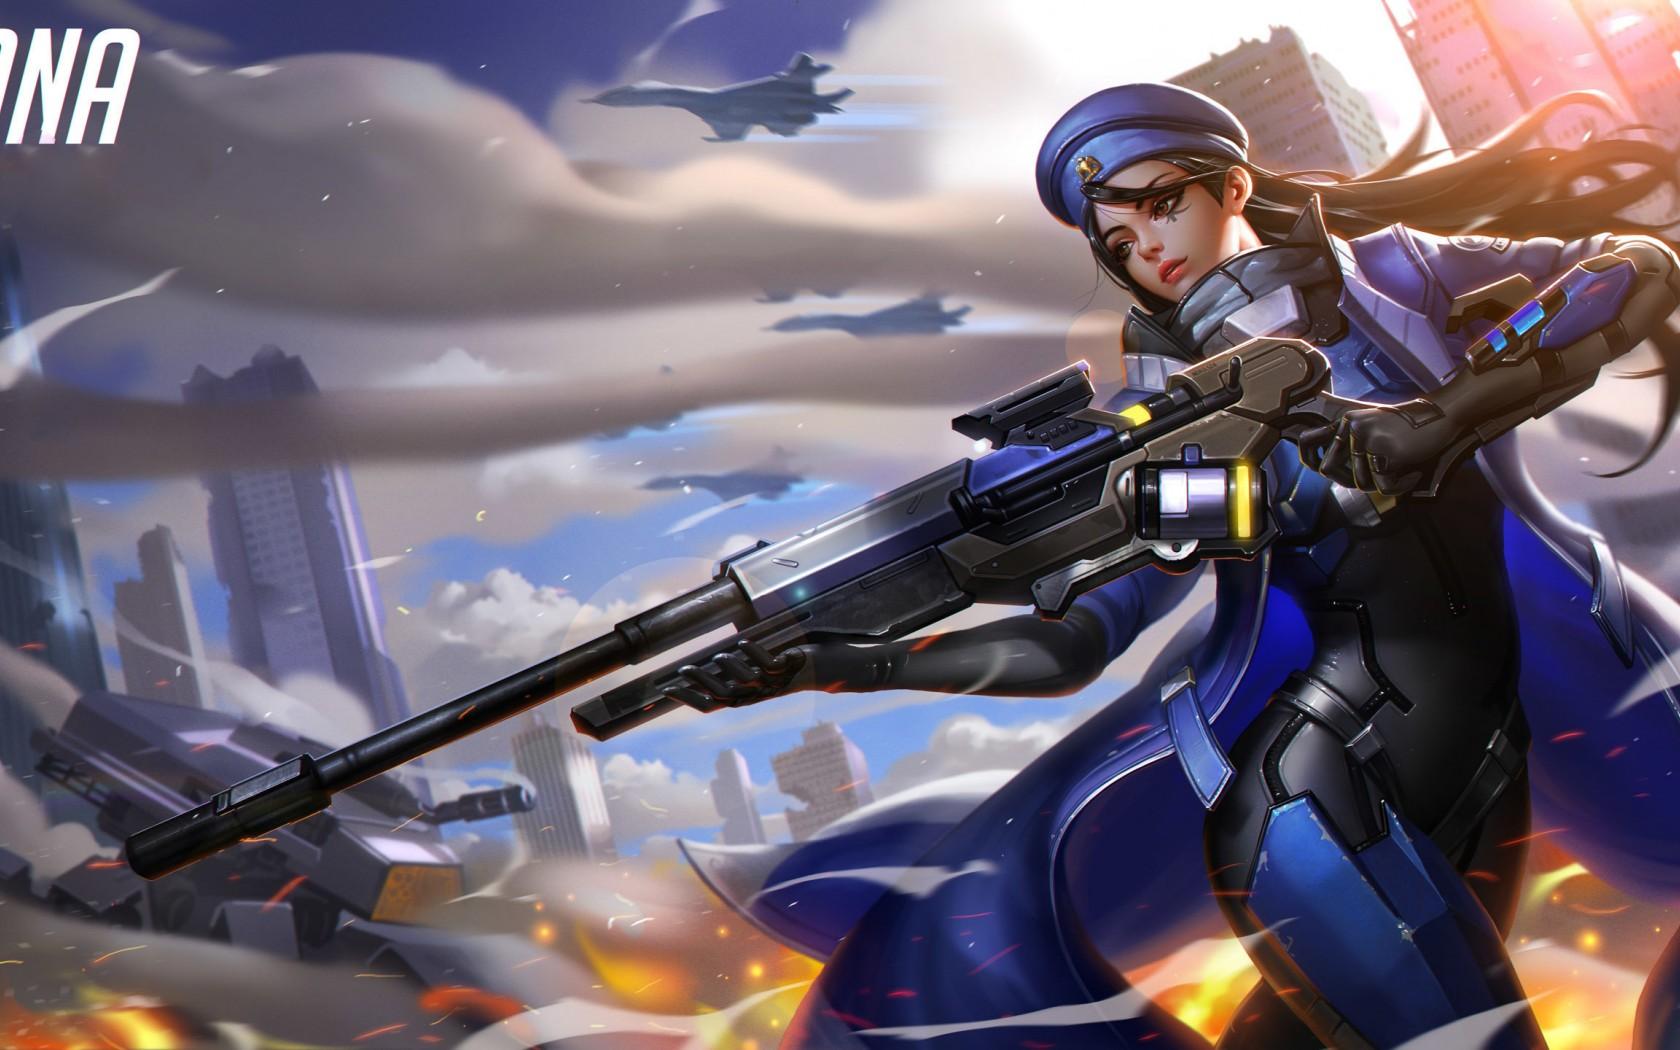 Wallpaper Overwatch Ana Blizzard Entertainment Girl